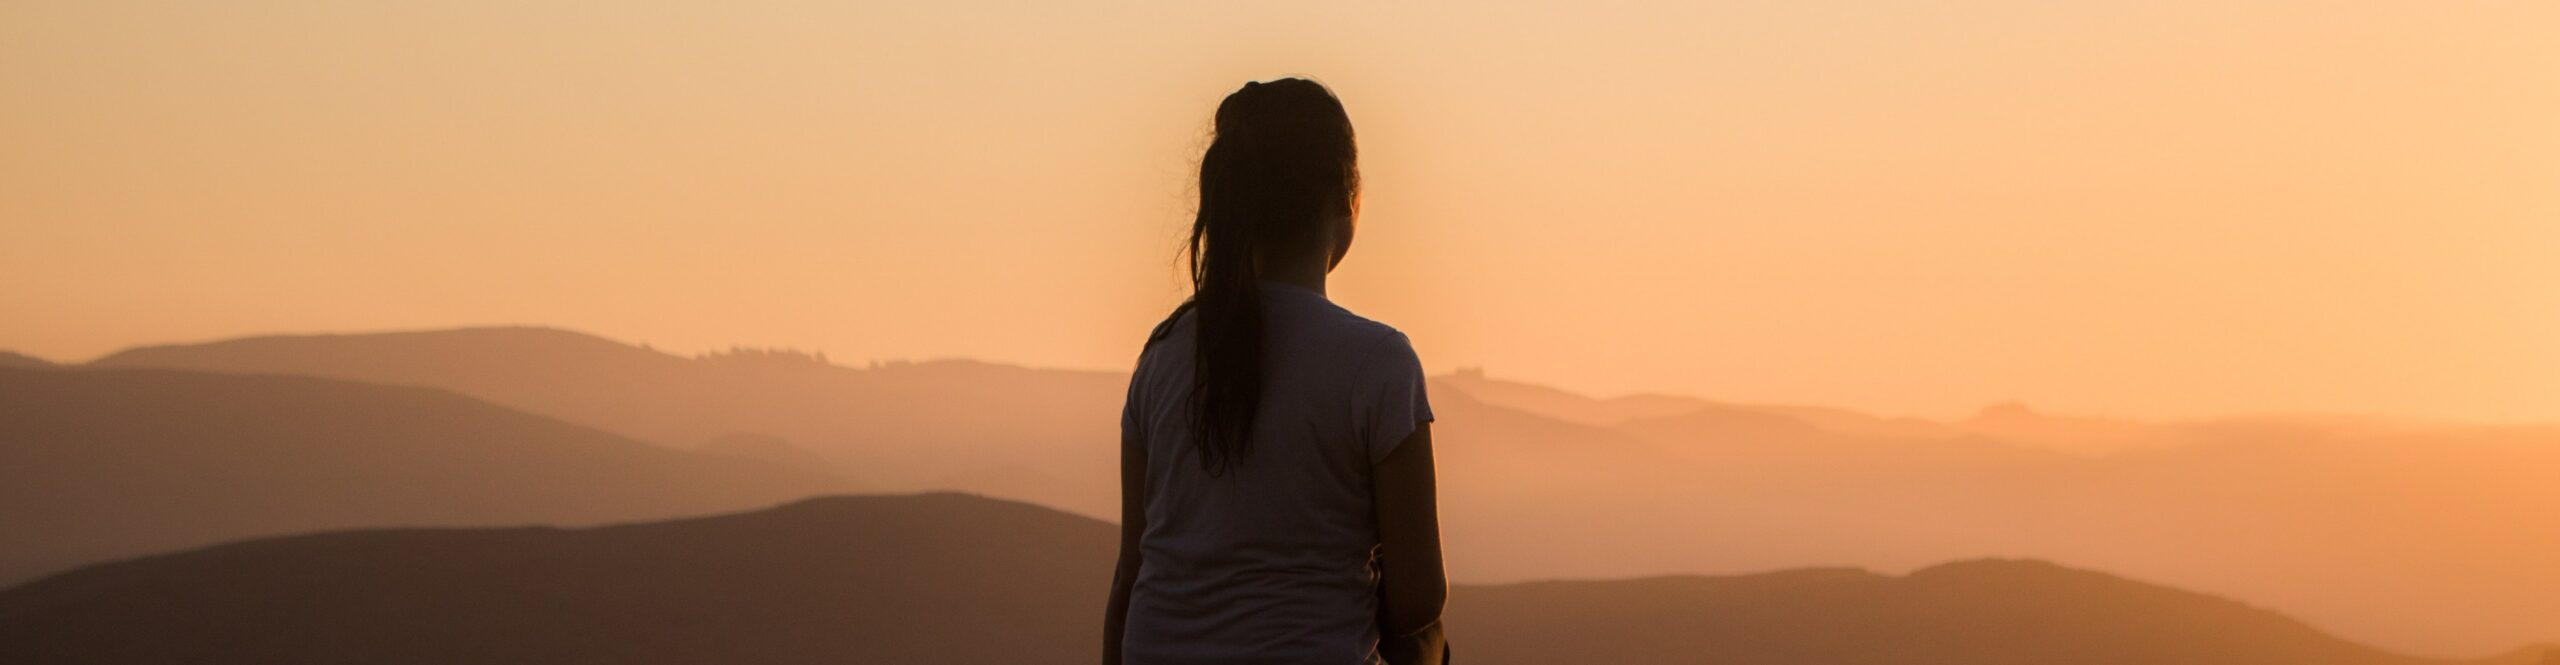 A pilgrim finding God in silence atop a mountain